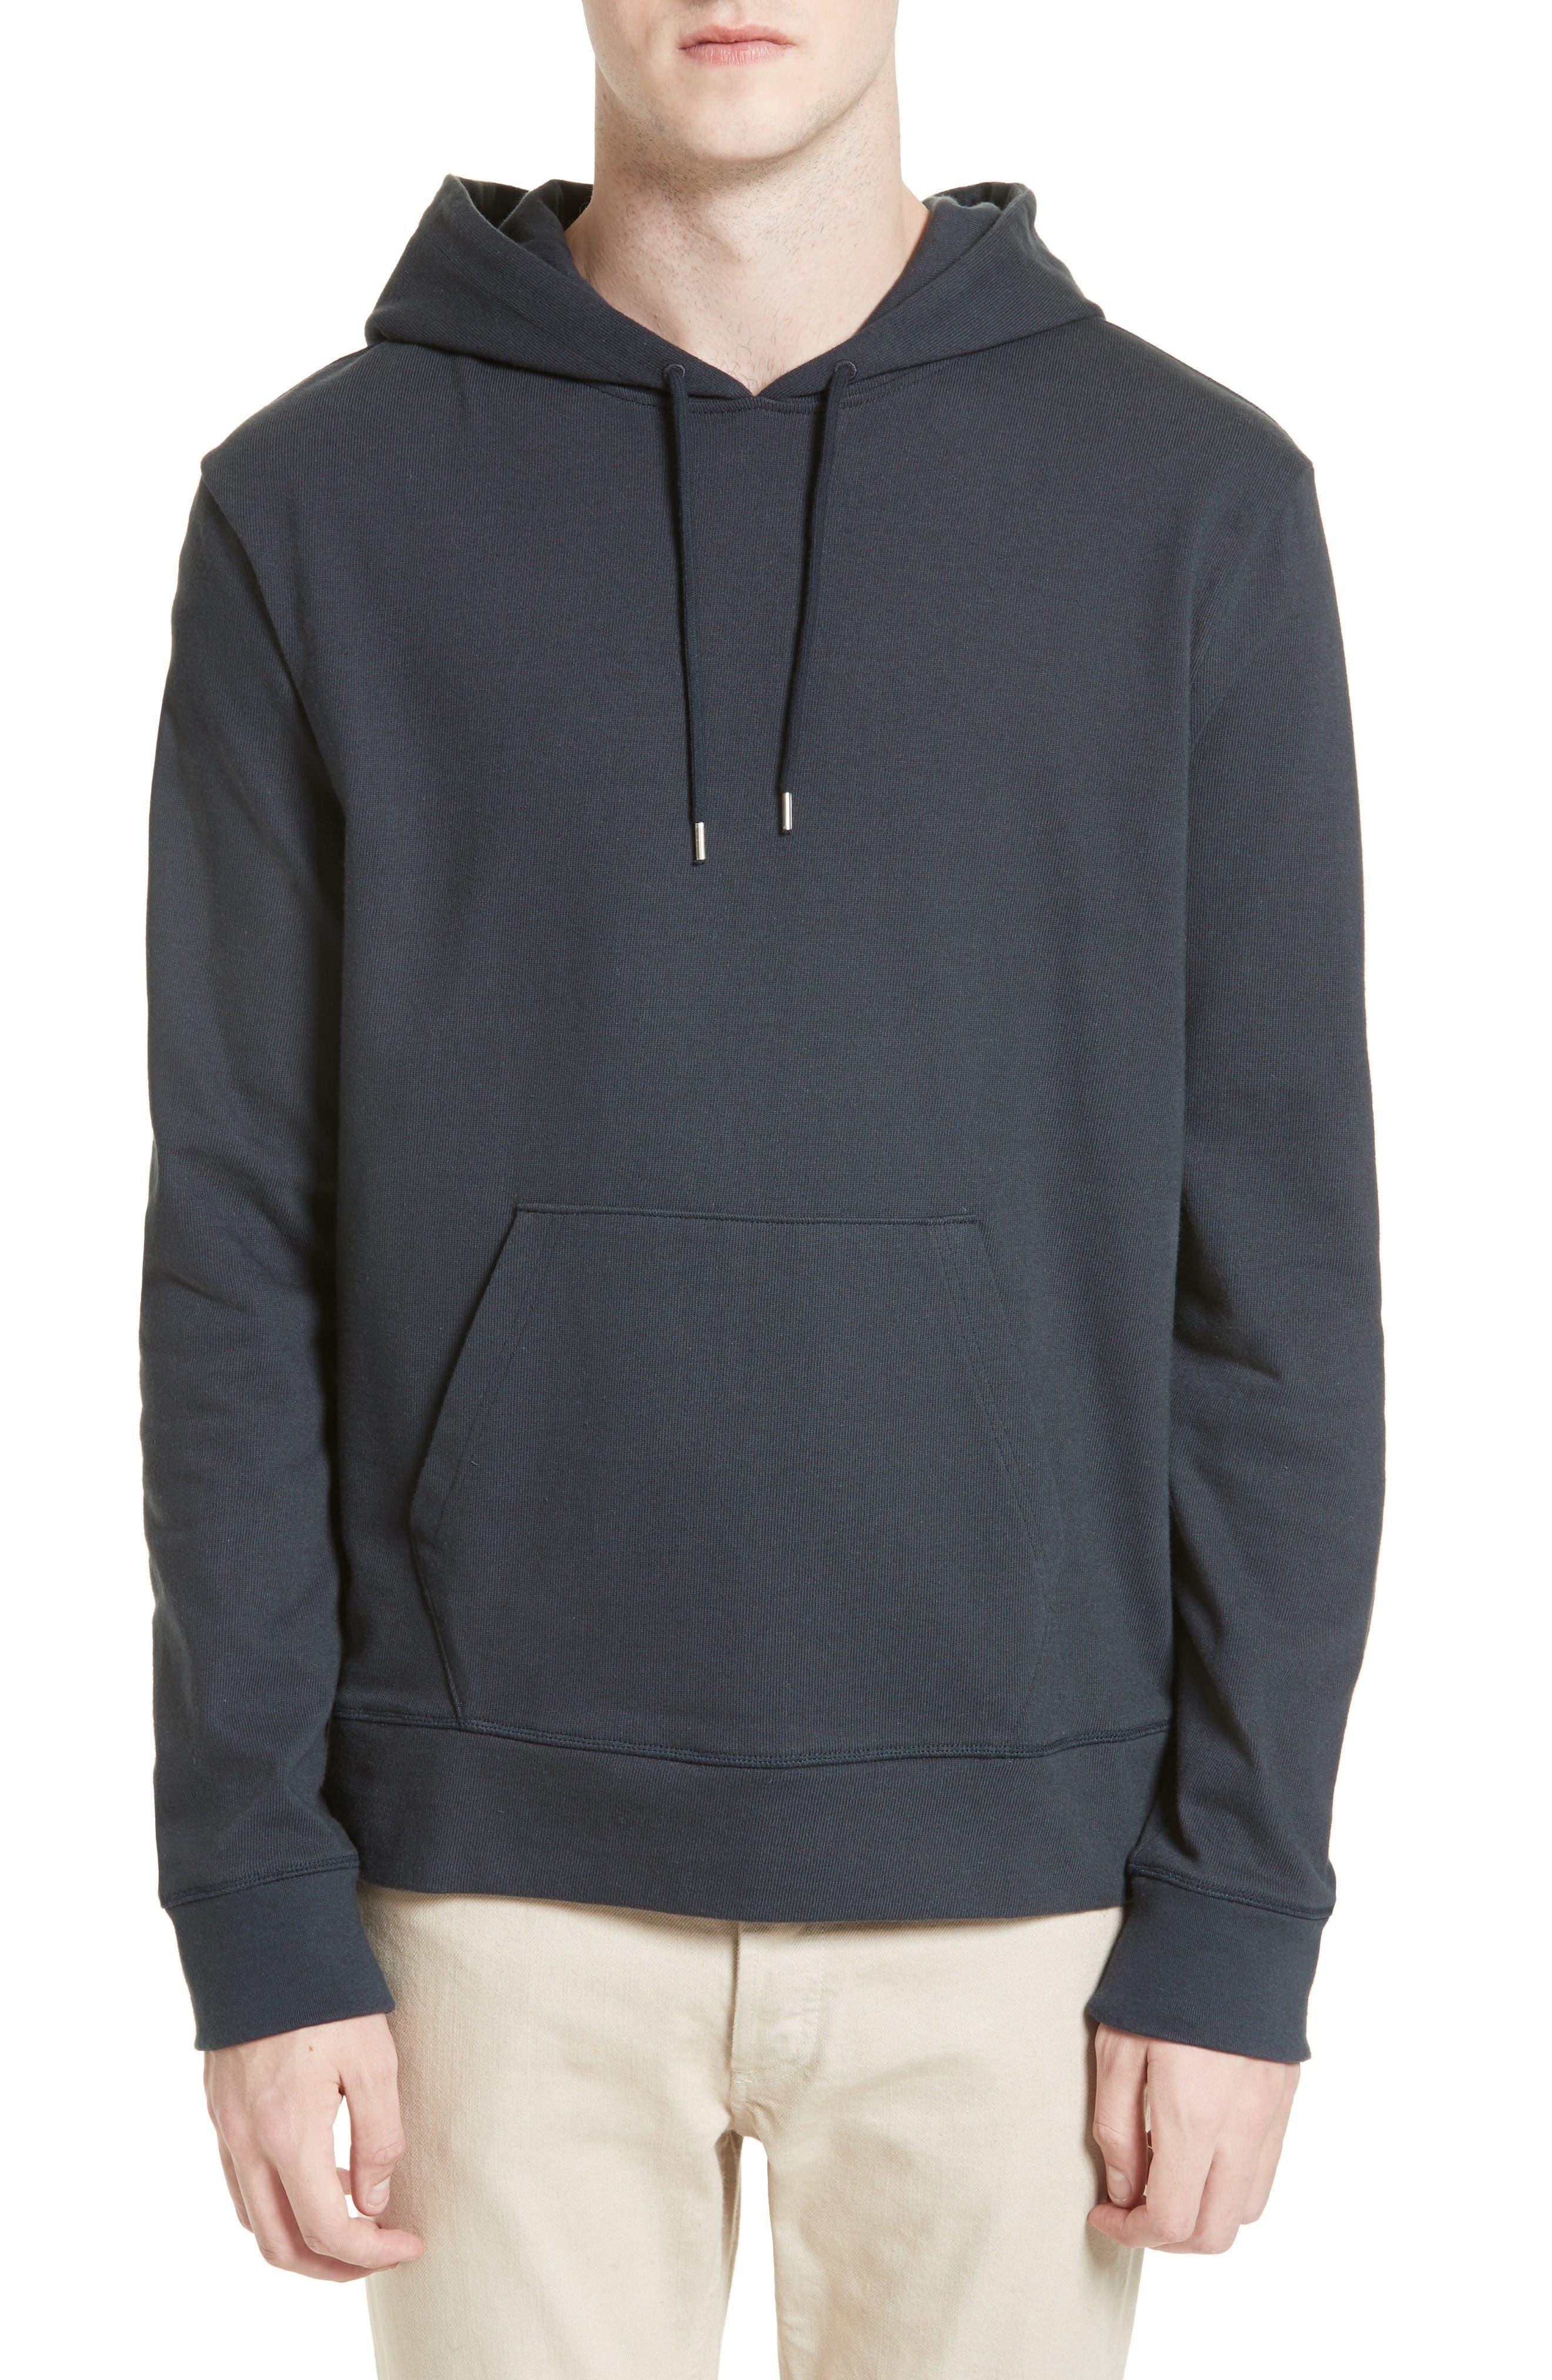 Brody Hooded Sweatshirt,                             Main thumbnail 1, color,                             Grey